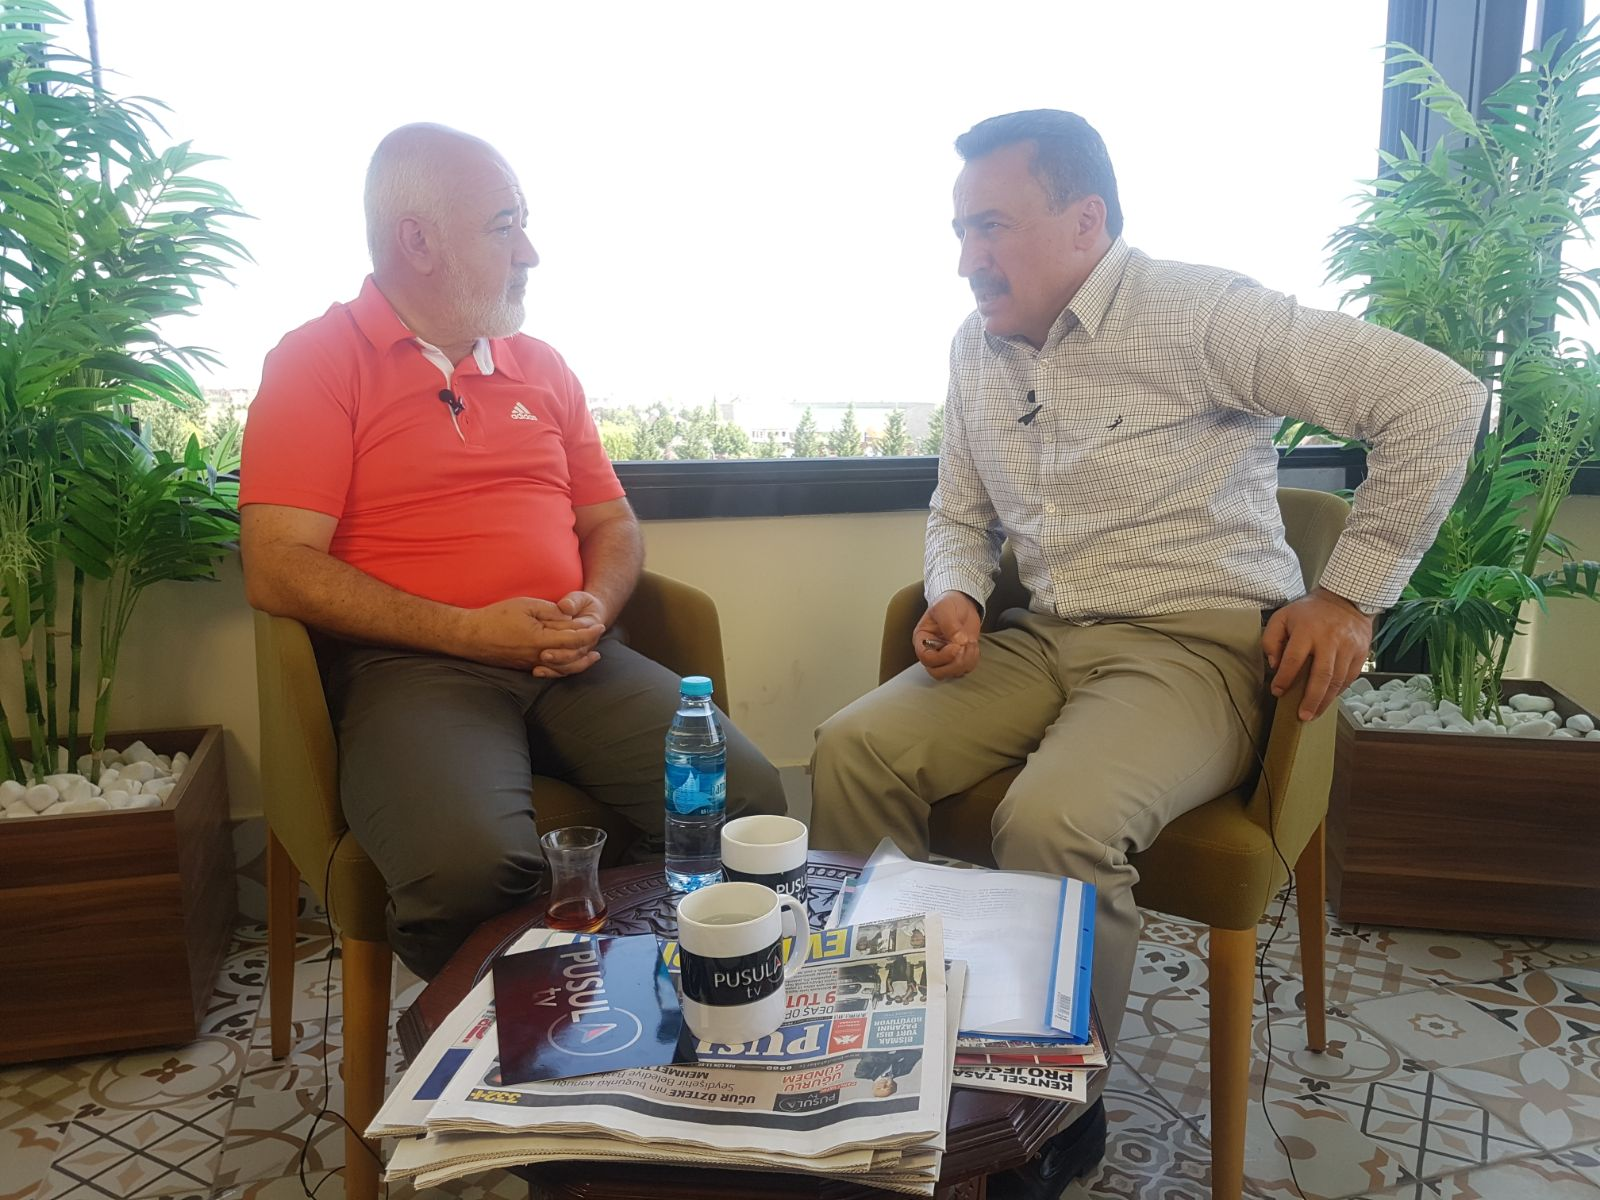 Konya'yı, Antalya'yı Seydişehir'e taşıyacak